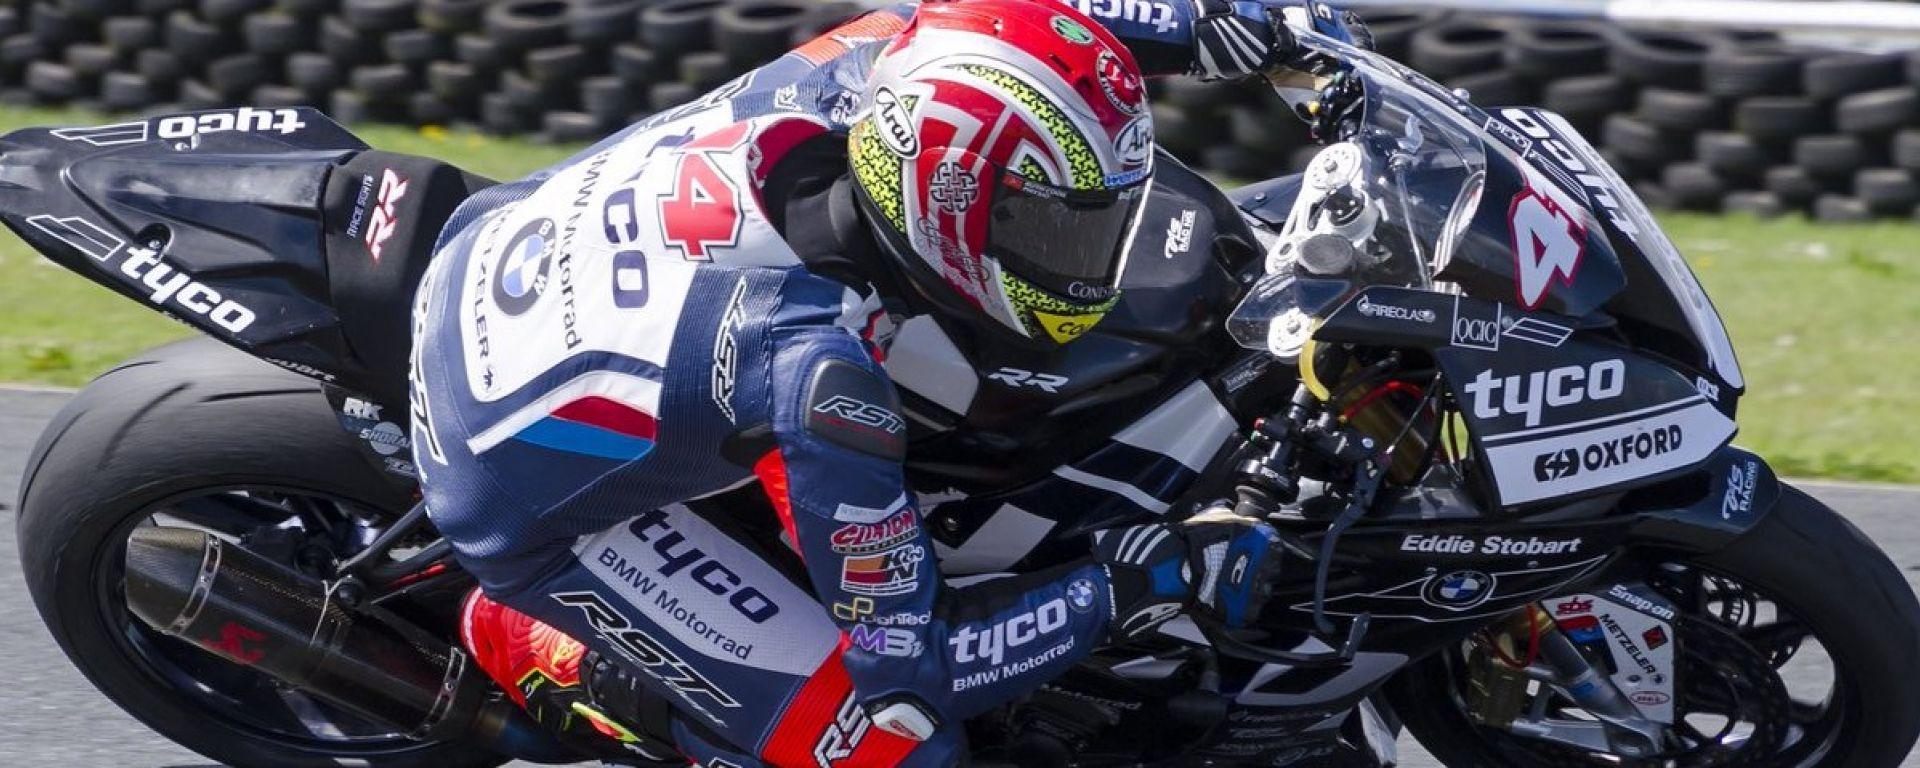 Dan Kneen ci lascia dopo un incidente nel Tourist Trophy TT 2018